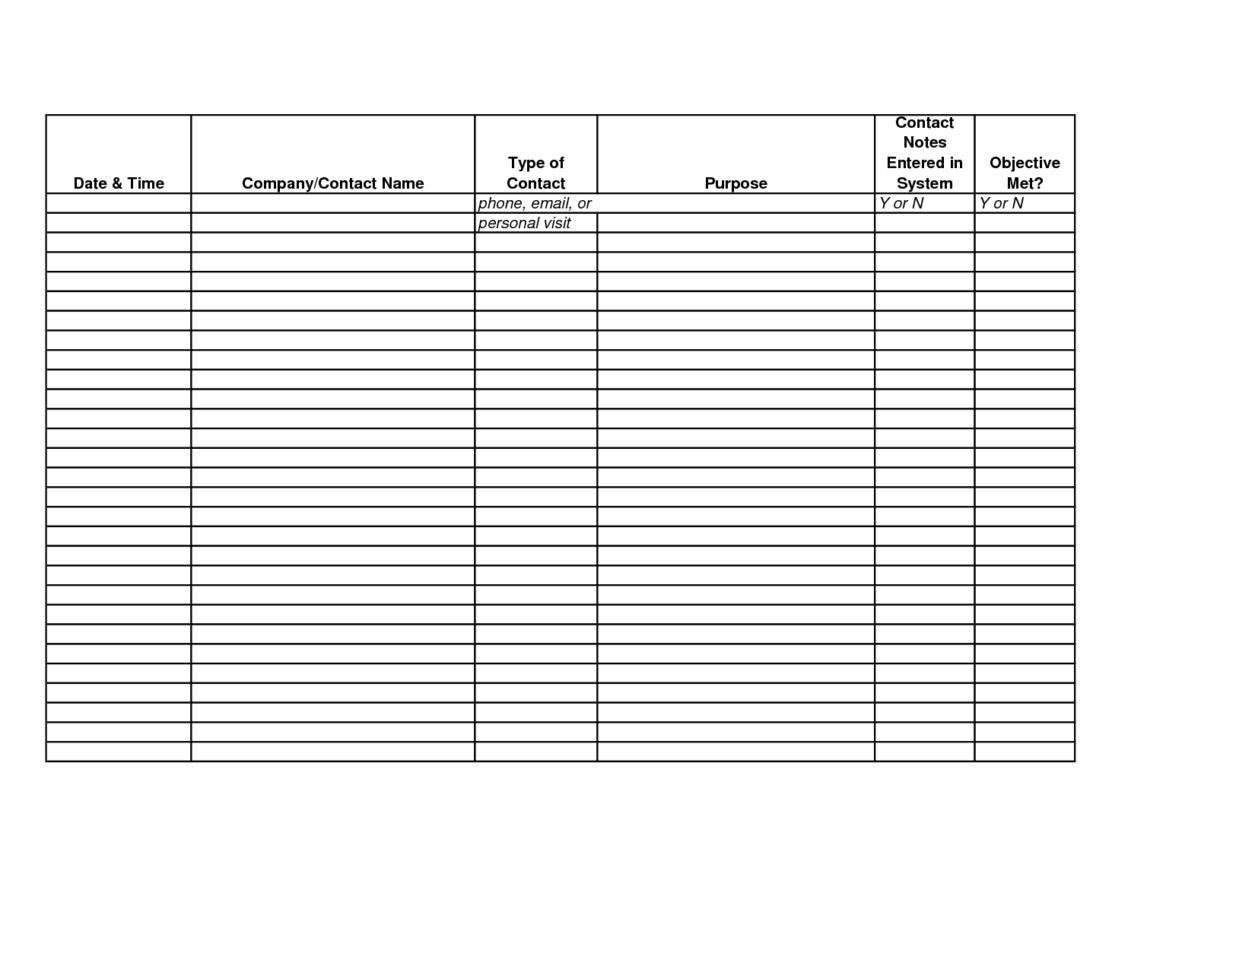 Time Clock Spreadsheet Free Download Pertaining To Time Clock Spreadsheet And With Calculator Plus Free Download